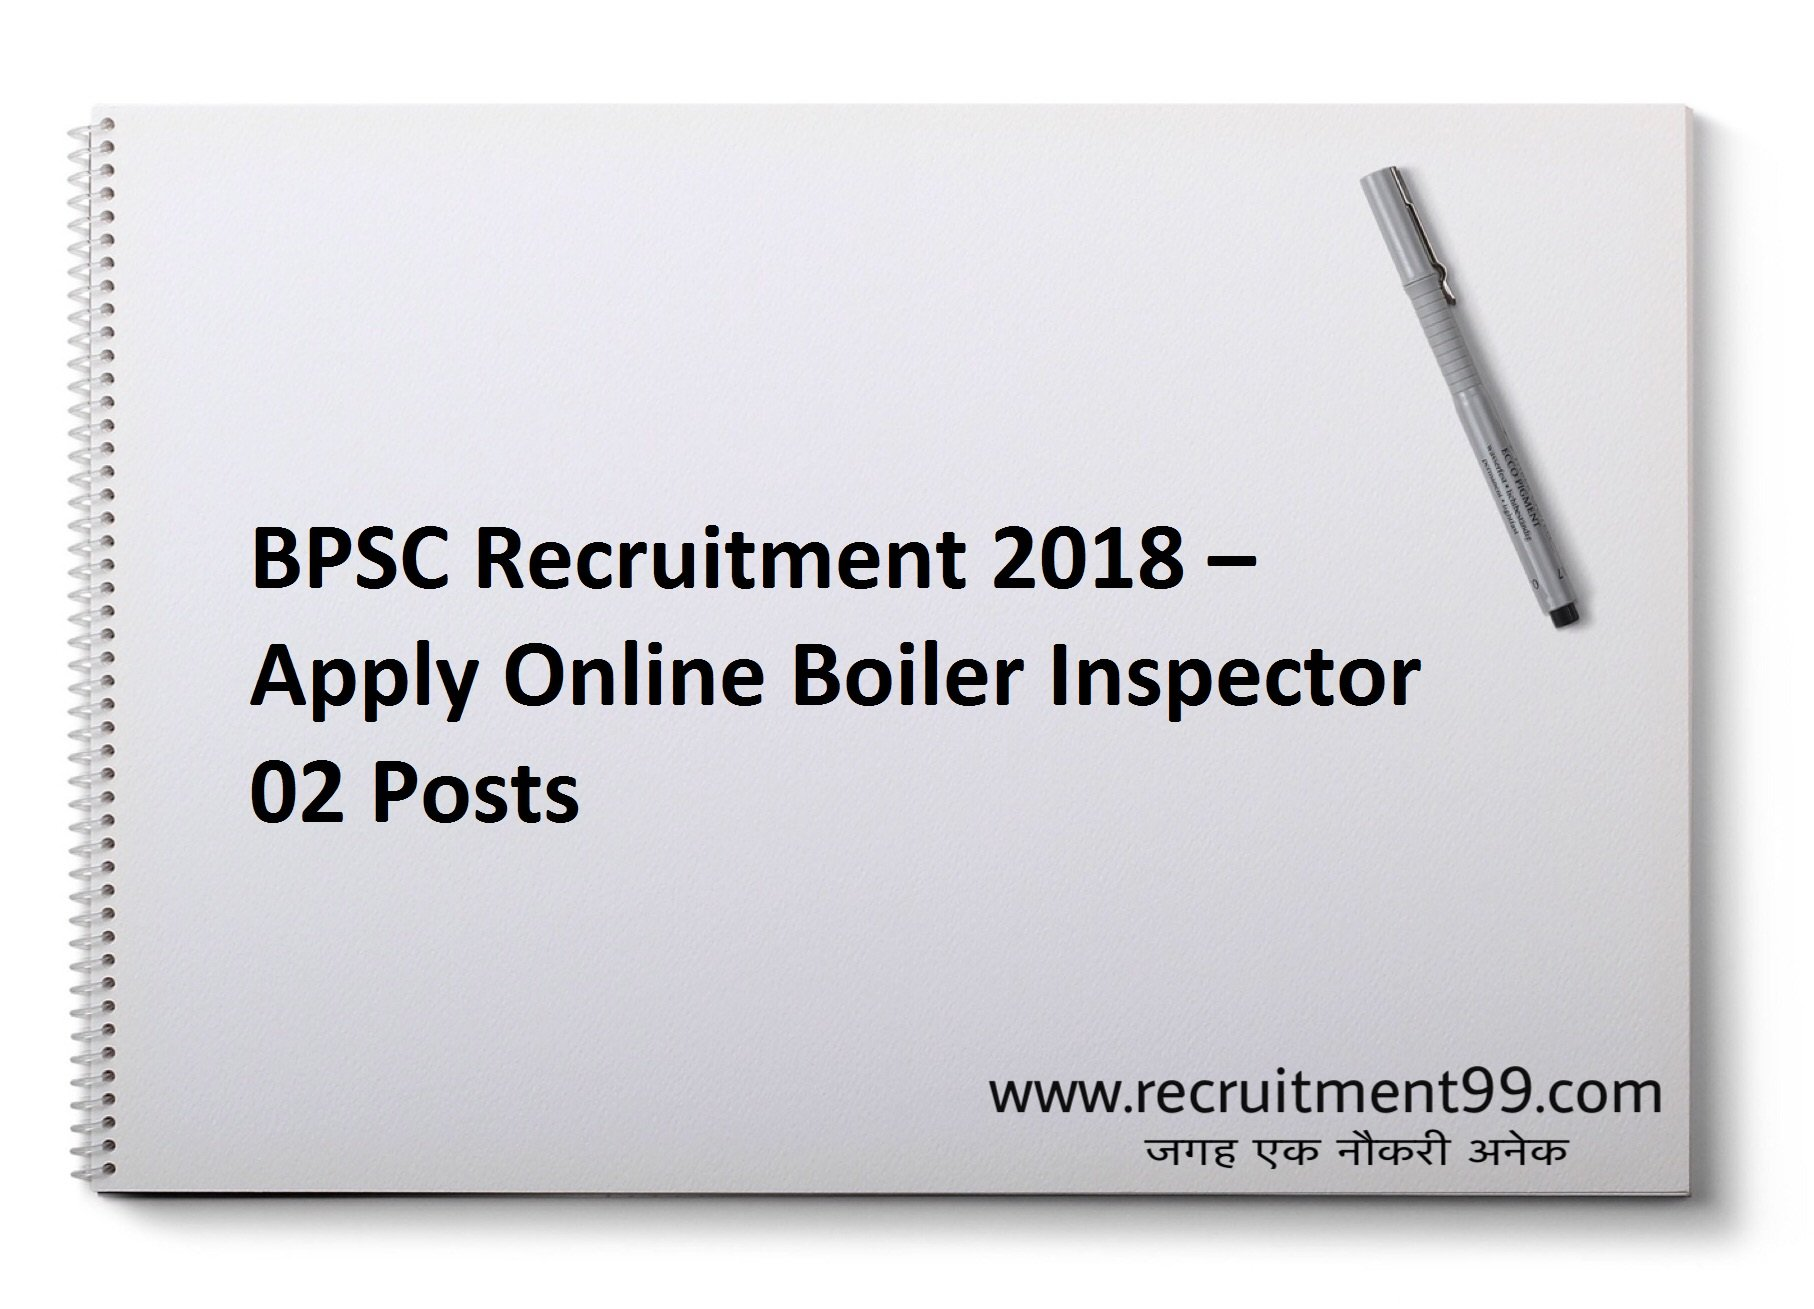 BPSC Boiler Inspector Recruitment Admit Card & Result 2018